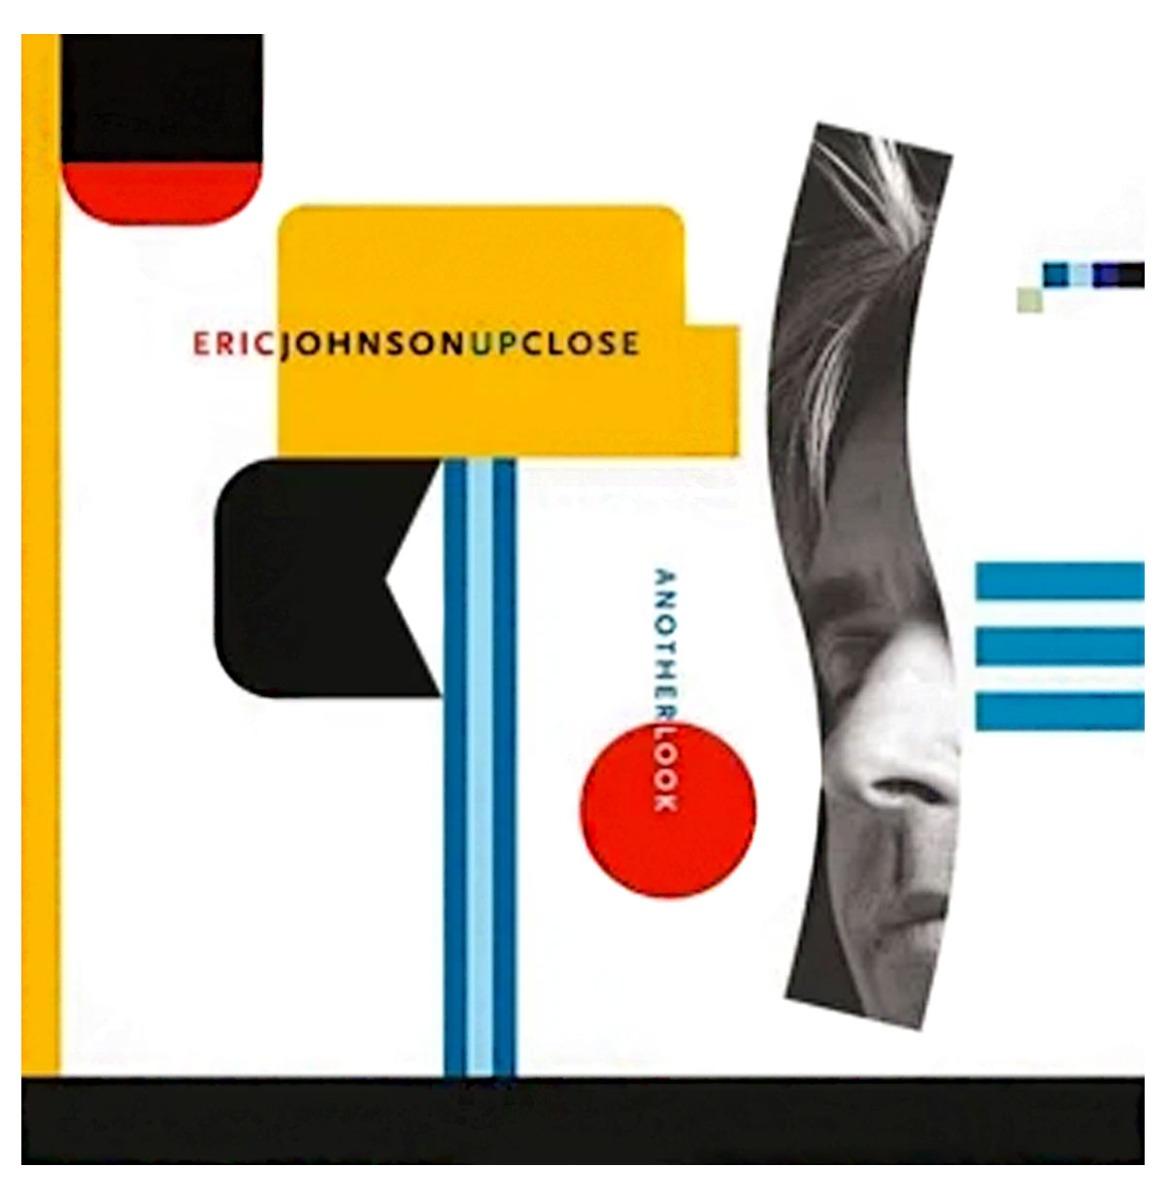 Eric Johnson - Up Close LP